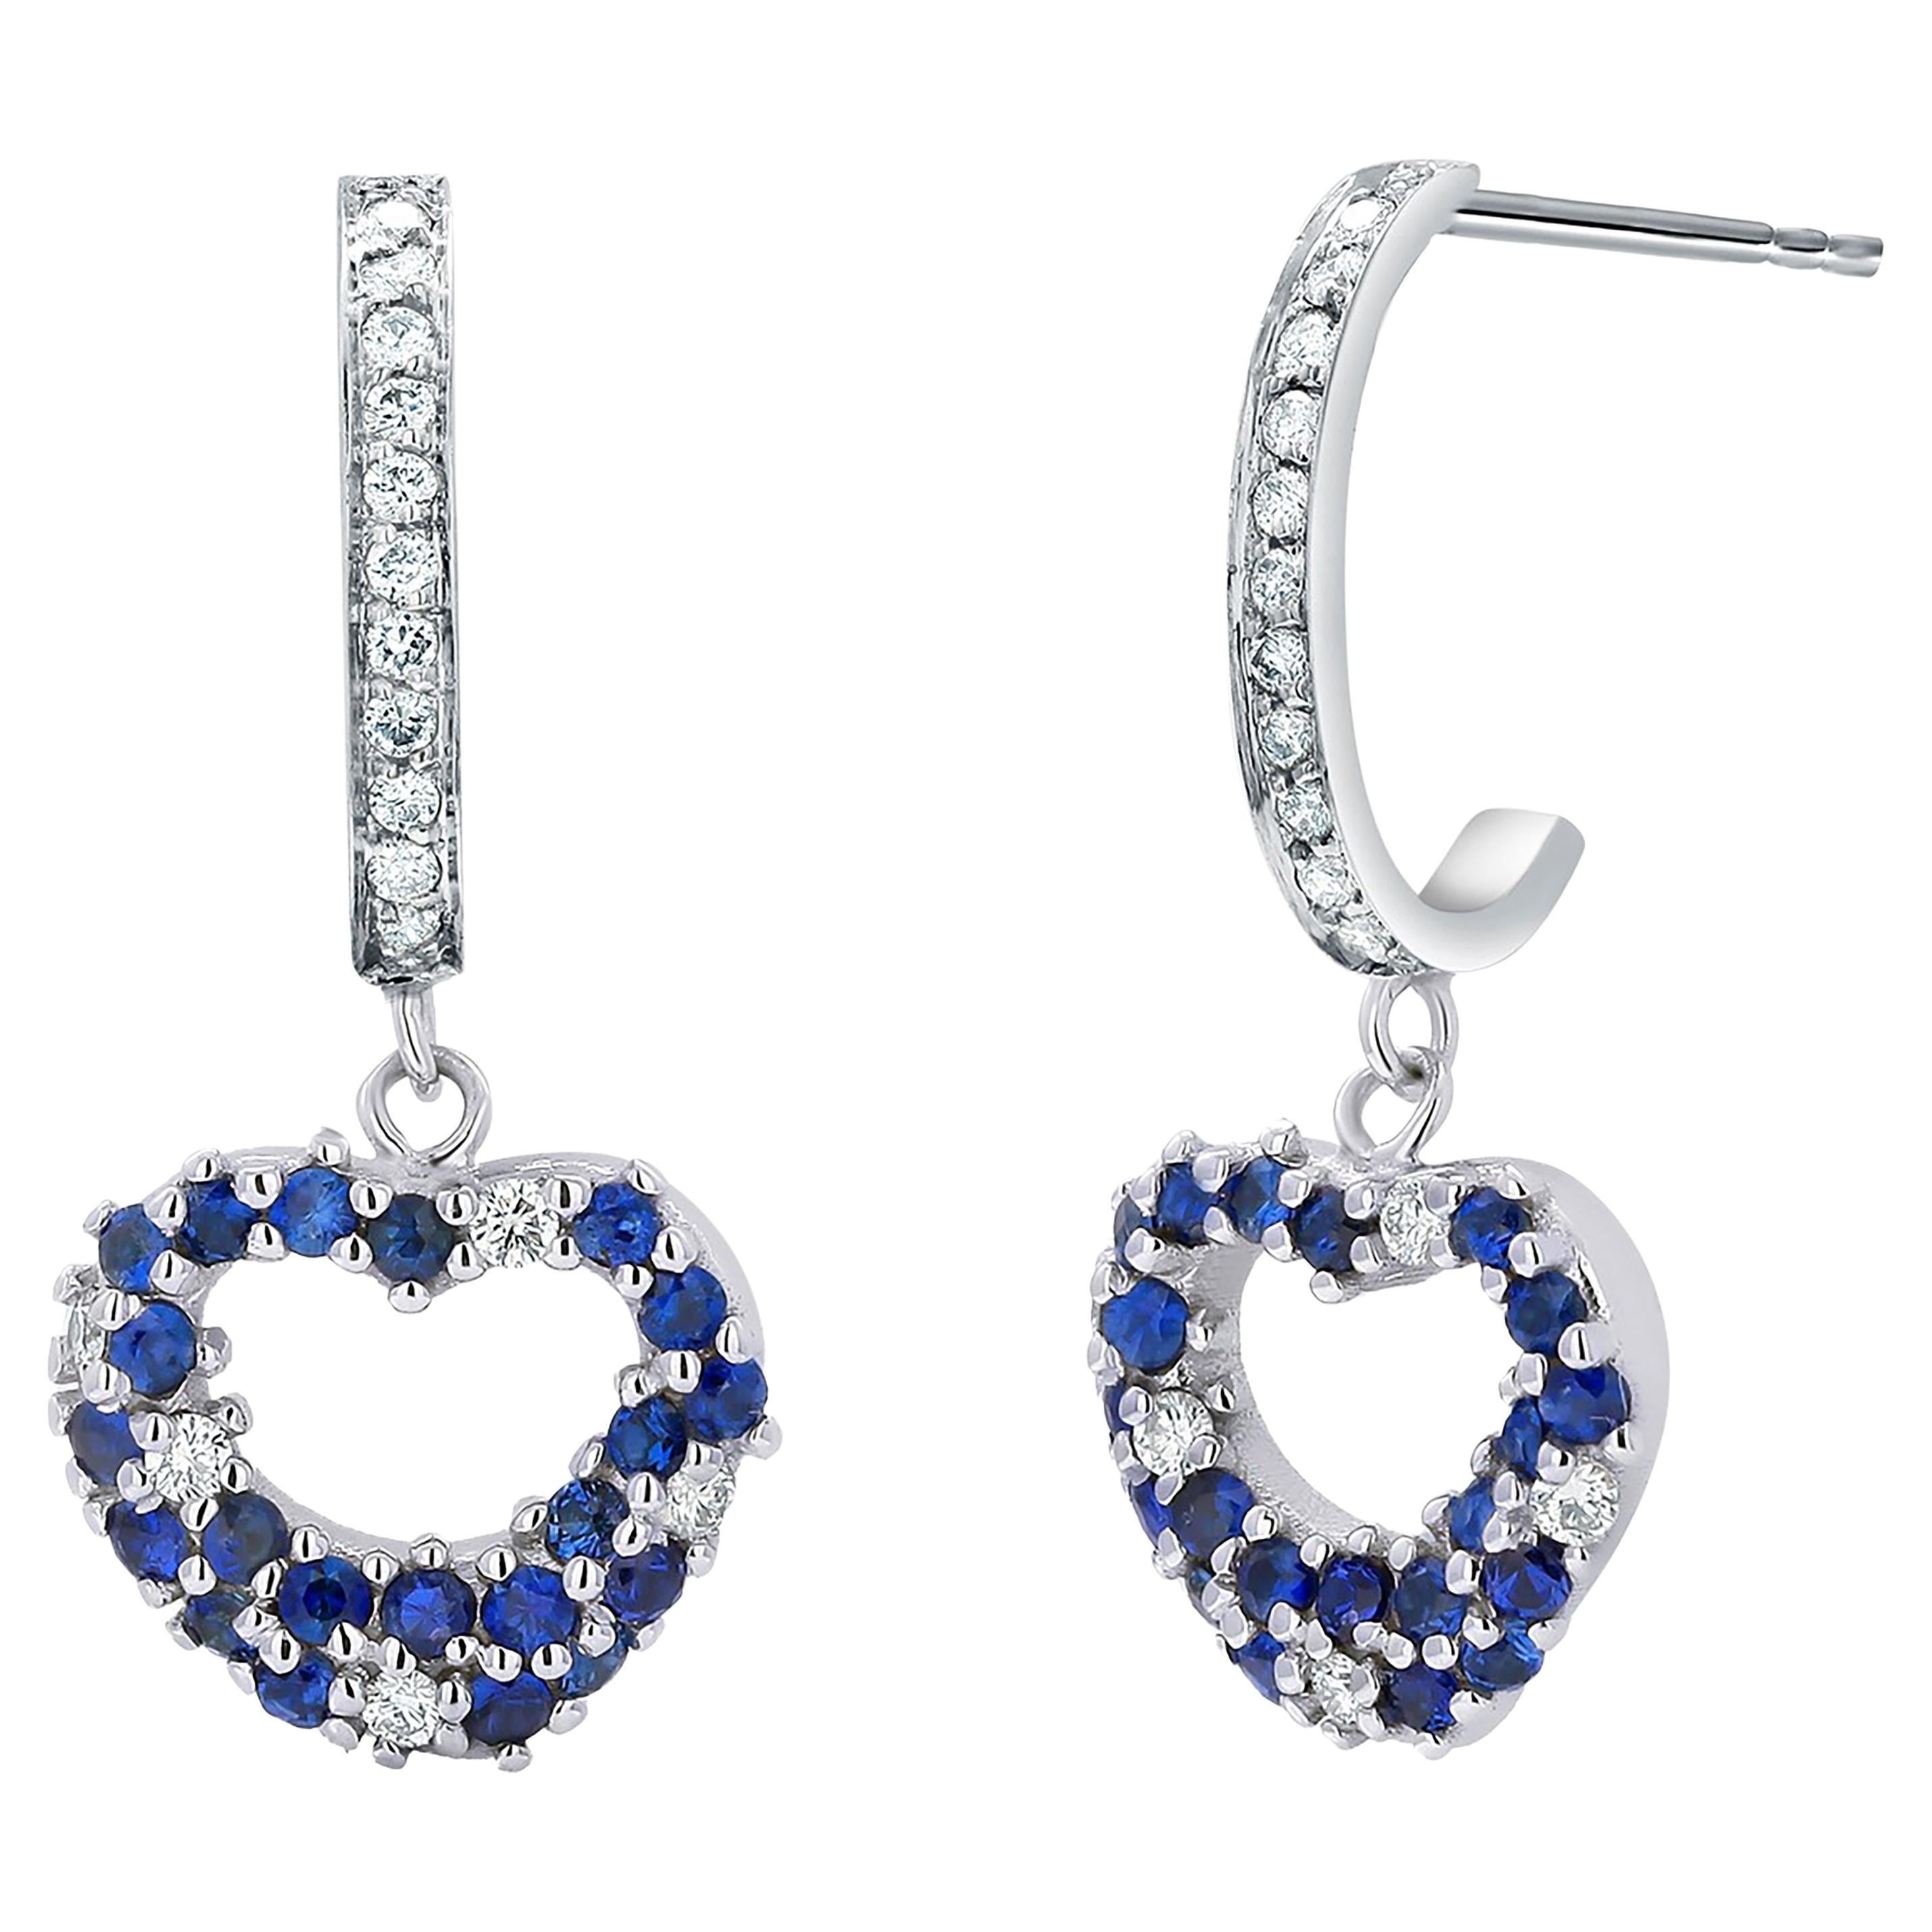 Sapphires and Diamond Heart Shaped White Gold Diamond Hoop Earrings